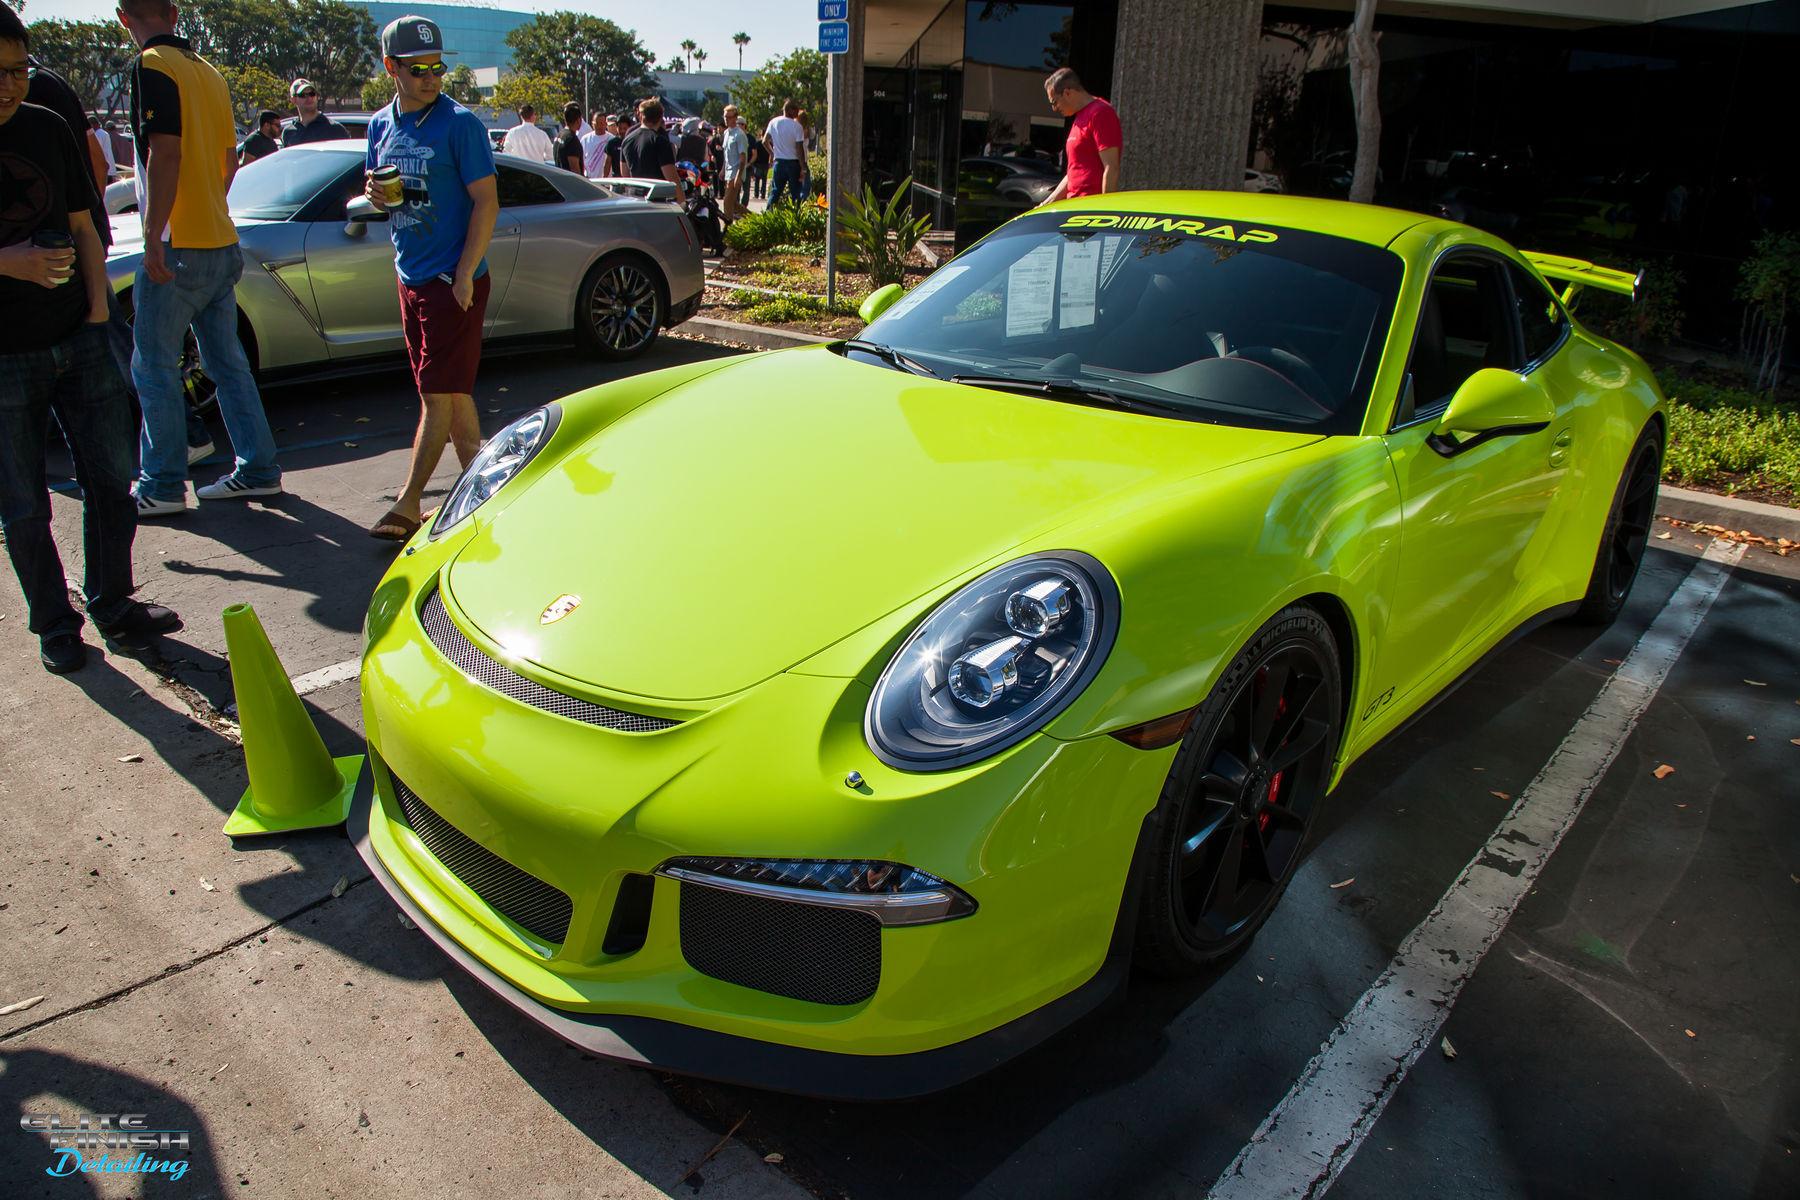 2015 Porsche 911 | San Diego Cars & Coffee October 15th, 2016